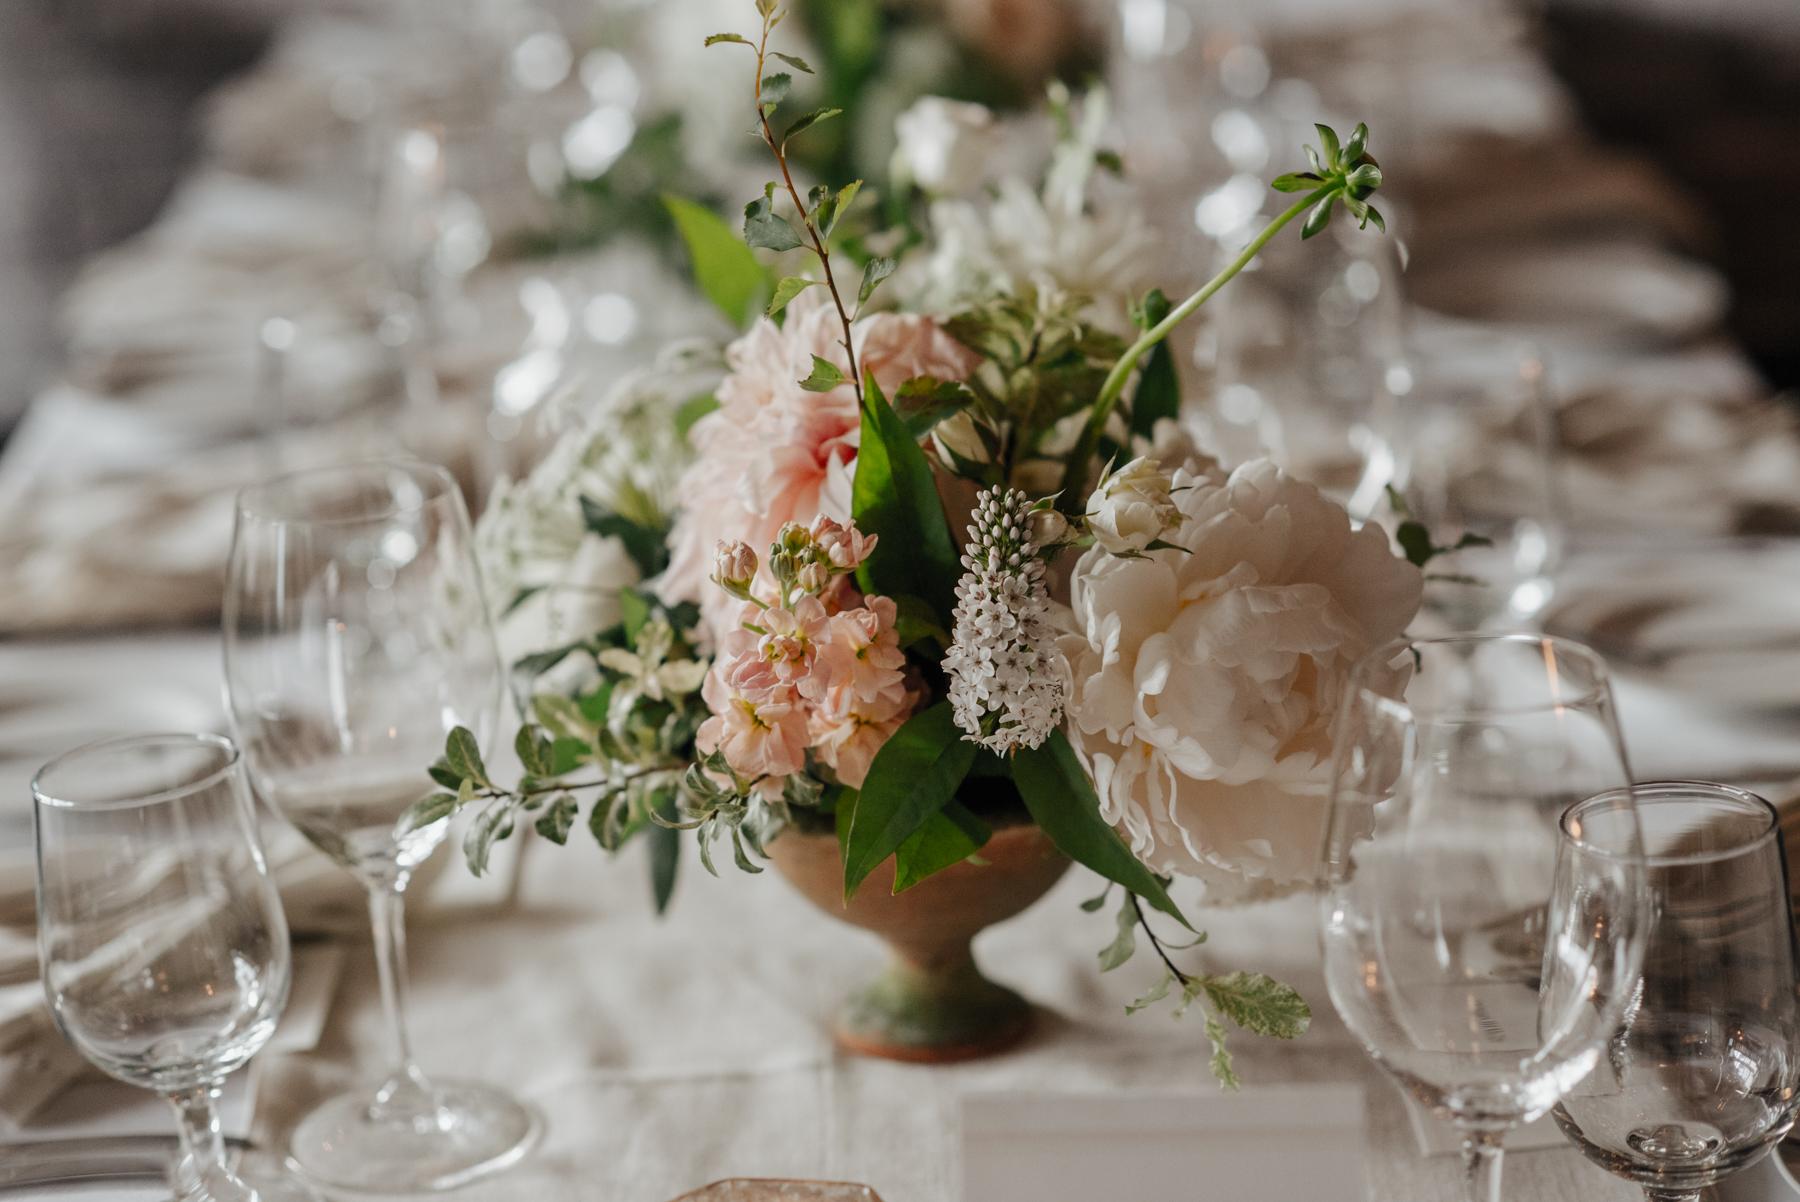 kaoverii_silva_photographer_cynthia_richard_wedding_vancouver_brix_&_mortar-25.jpg